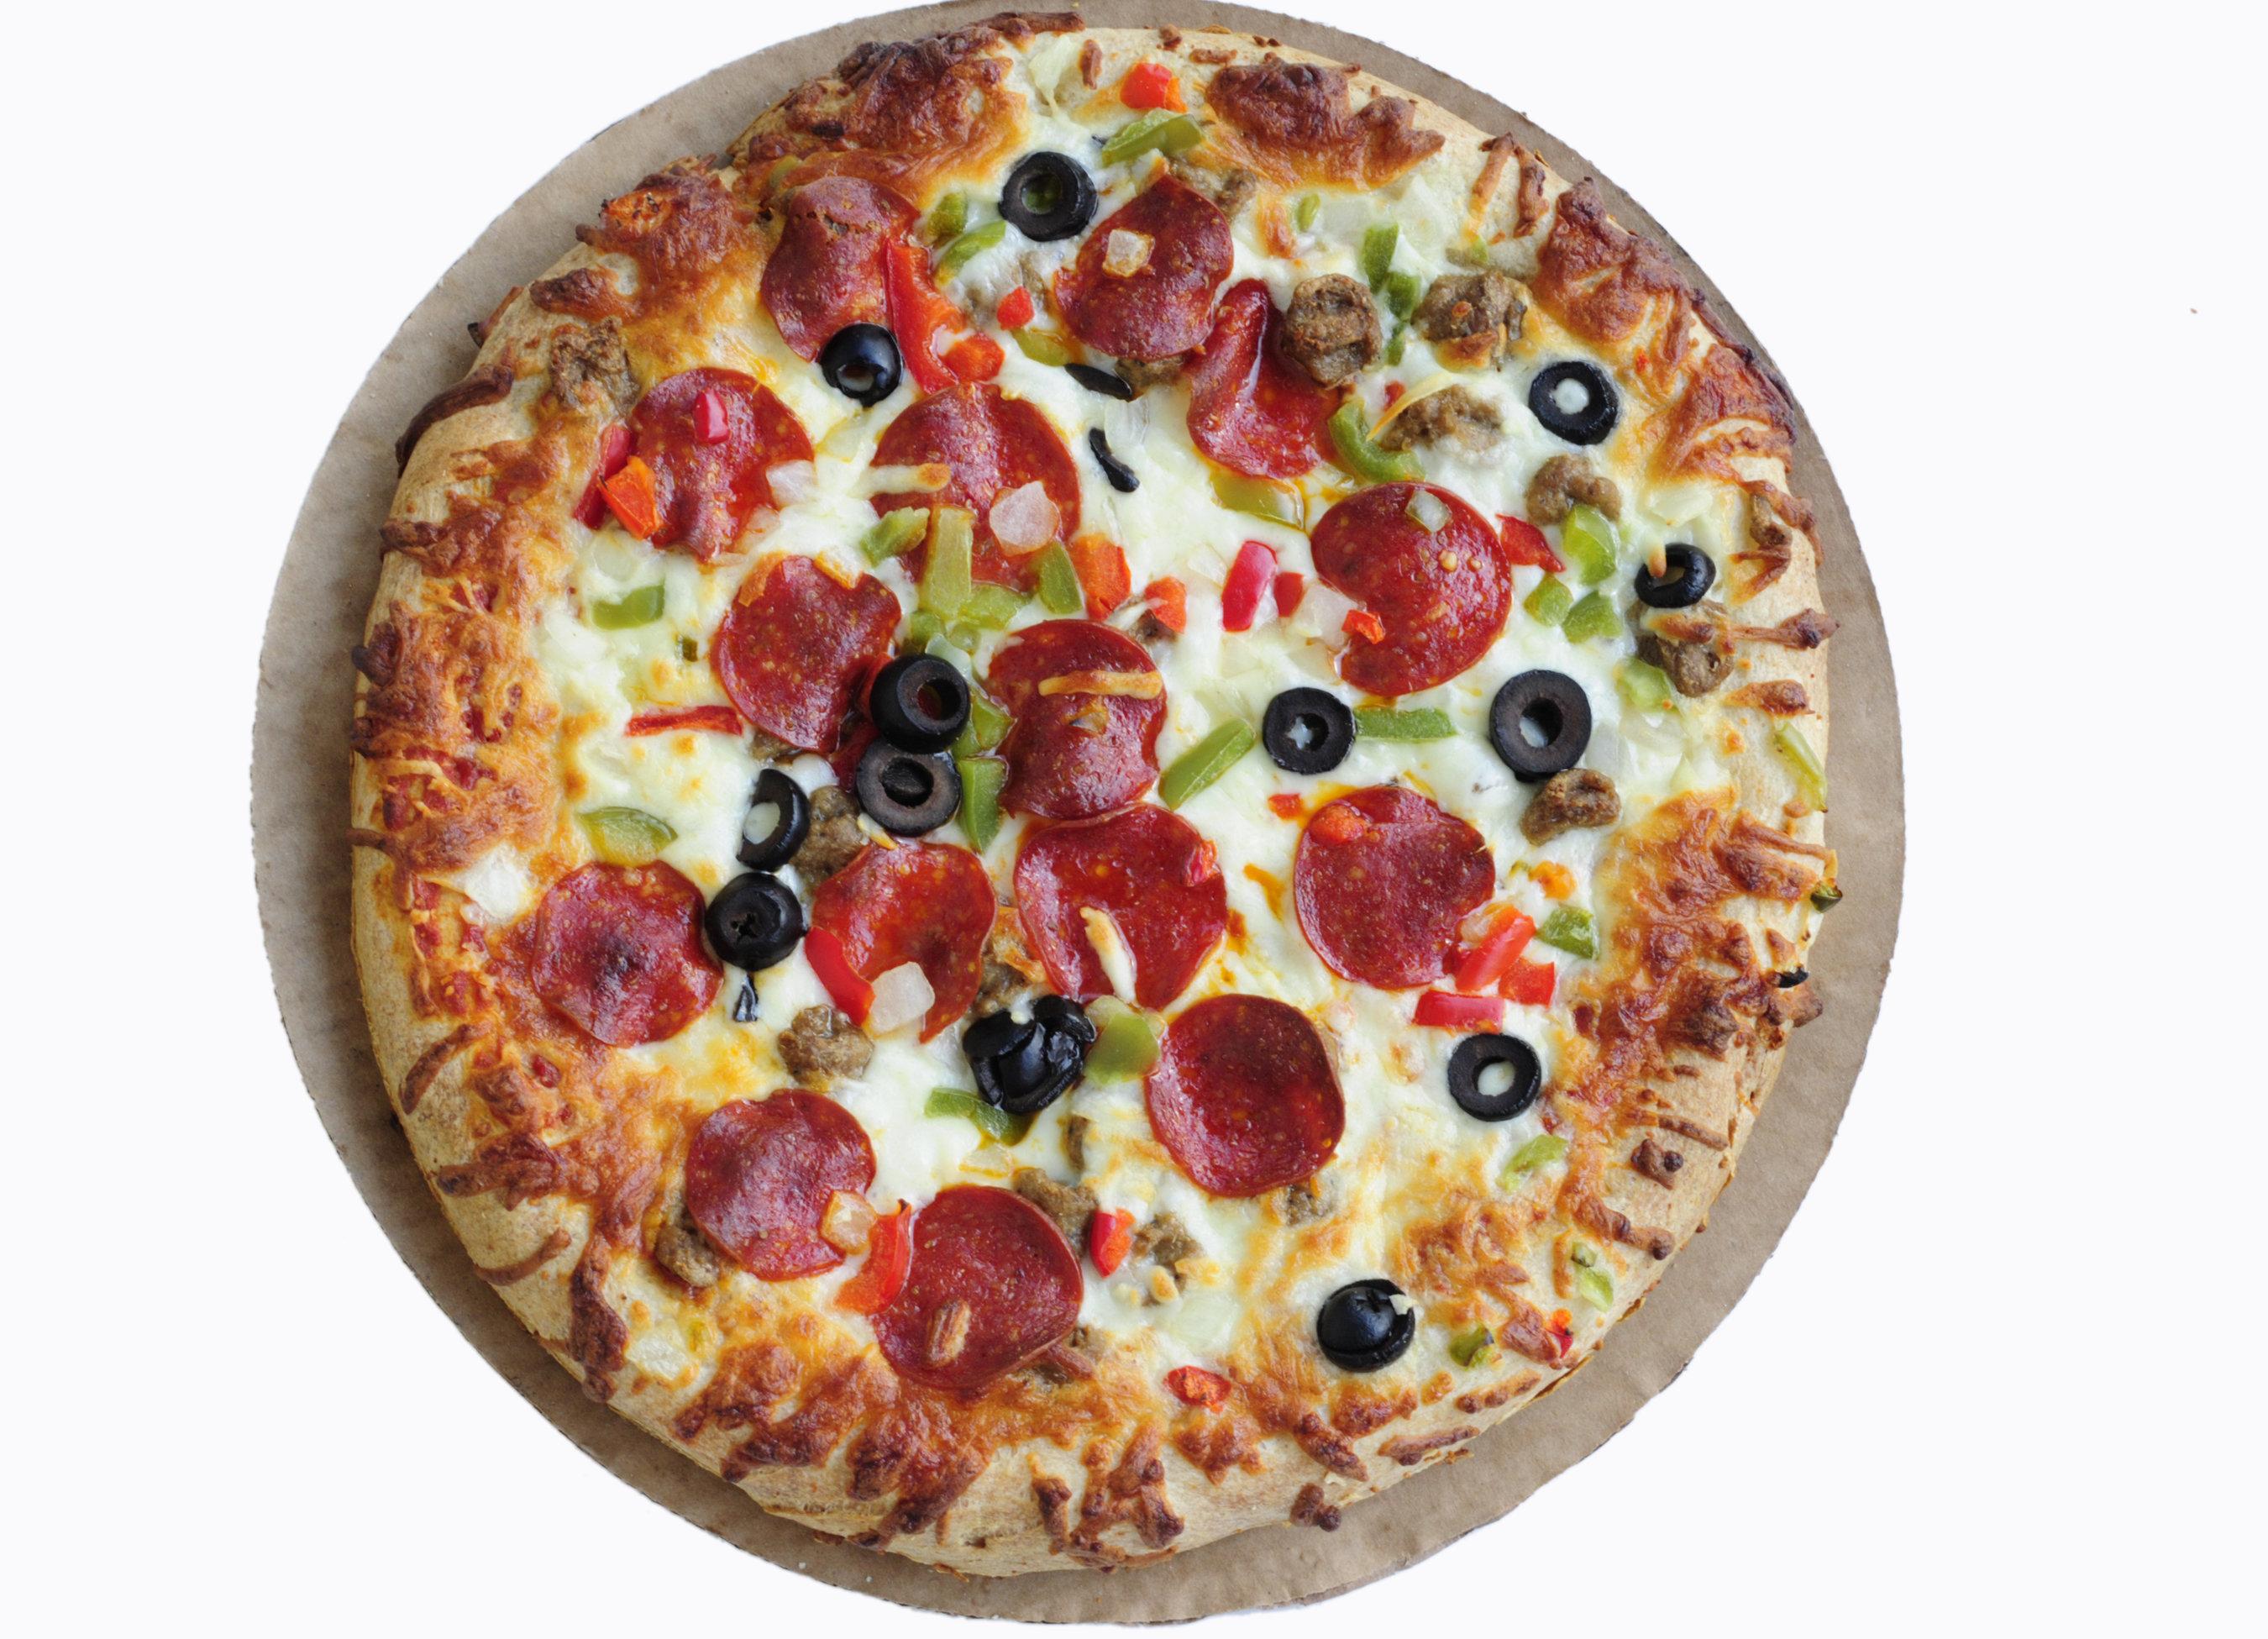 California Pizza Kitchen Cauliflower Pizza Nutrition Facts